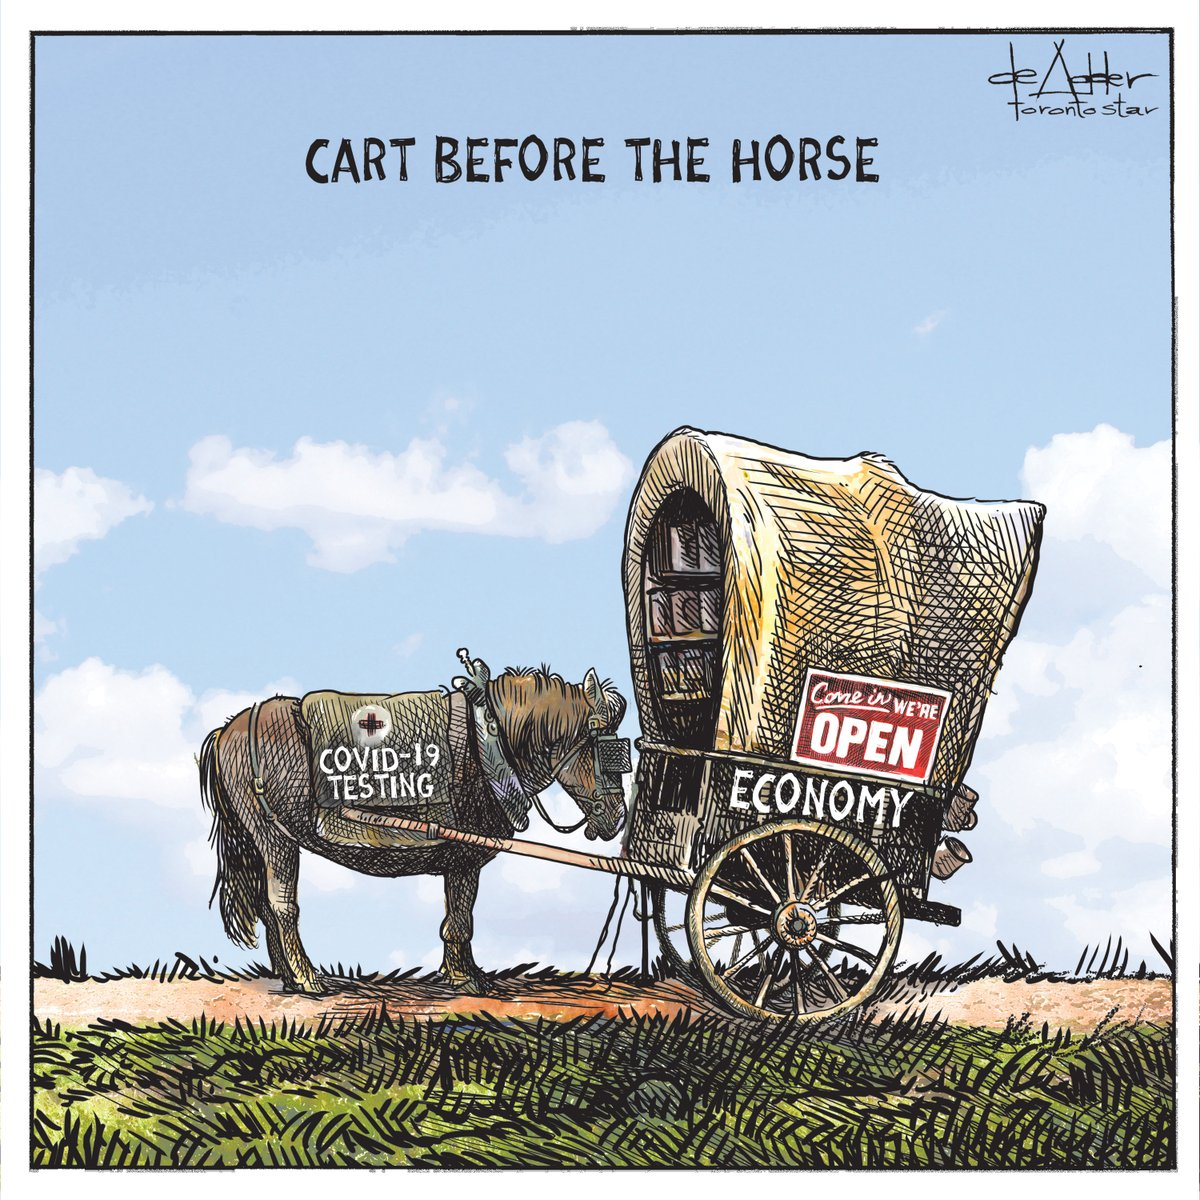 Cartoon for @TorontoStar #covid19 #coronavirus #economy #economywarriors #COVIDIOTSpic.twitter.com/1VUDgG8aI6